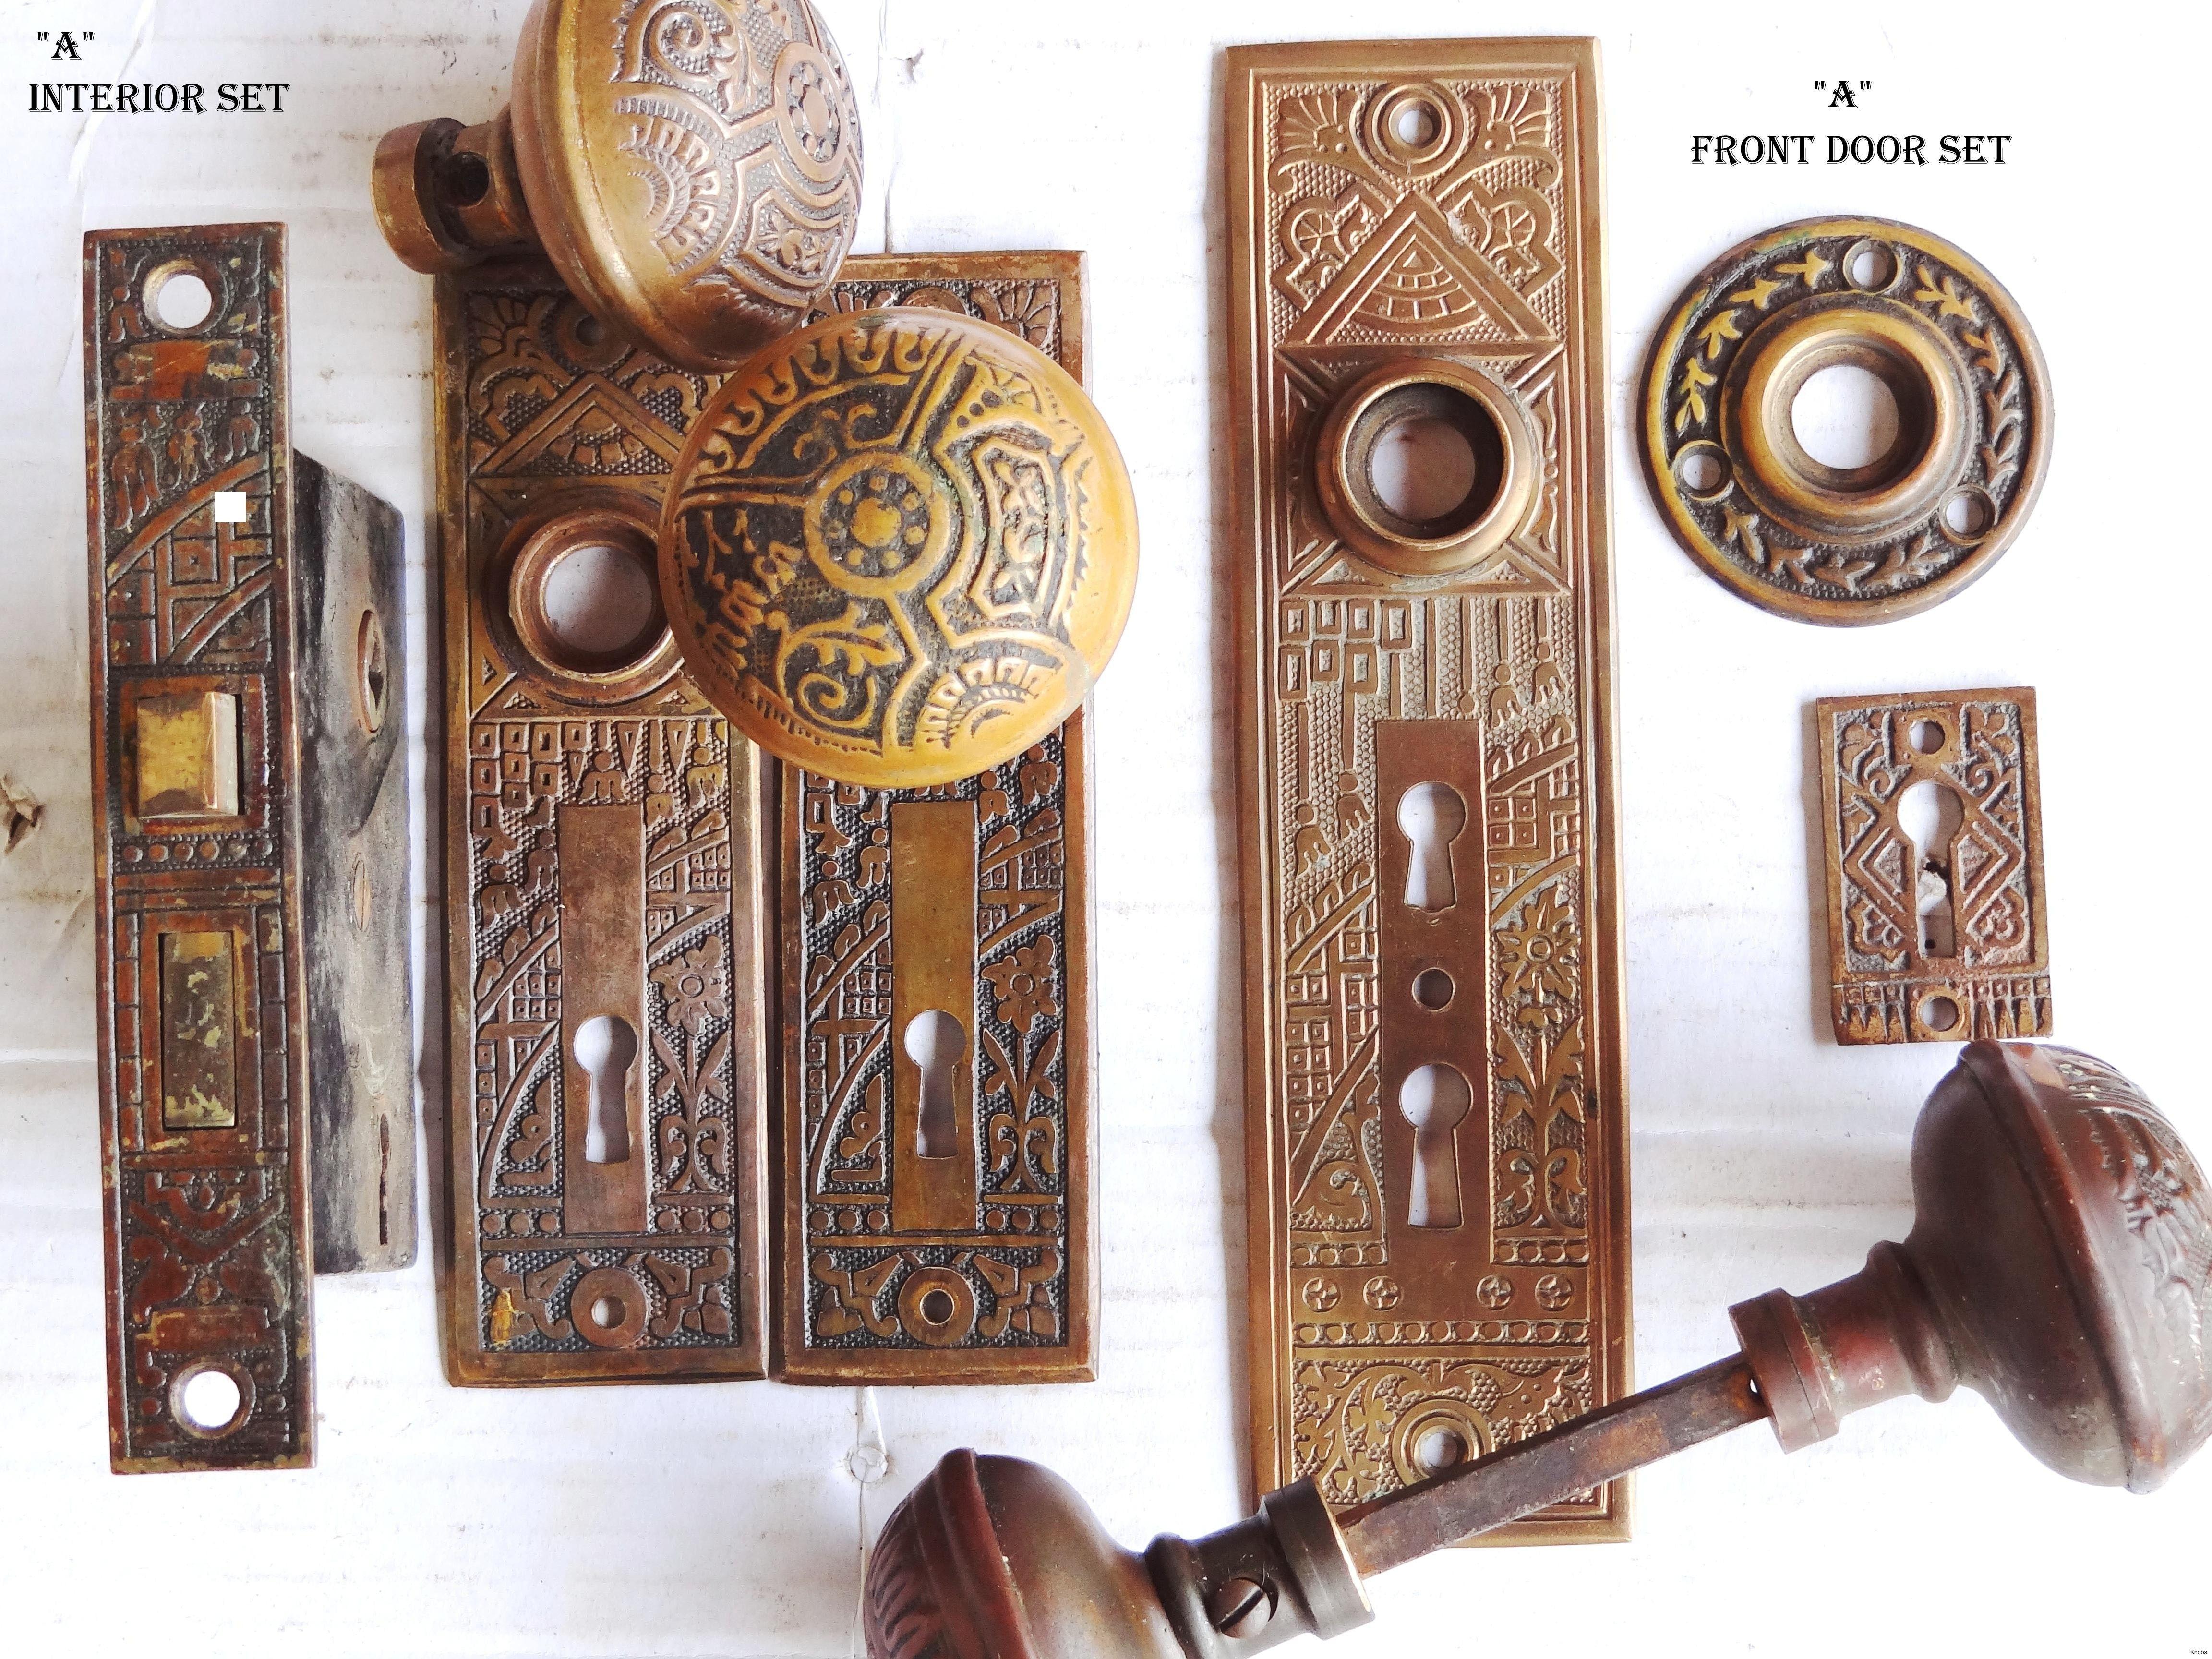 Nice Elegant Reproduction Antique Door Knobs Check More At  Https://homefurnitureone.com/